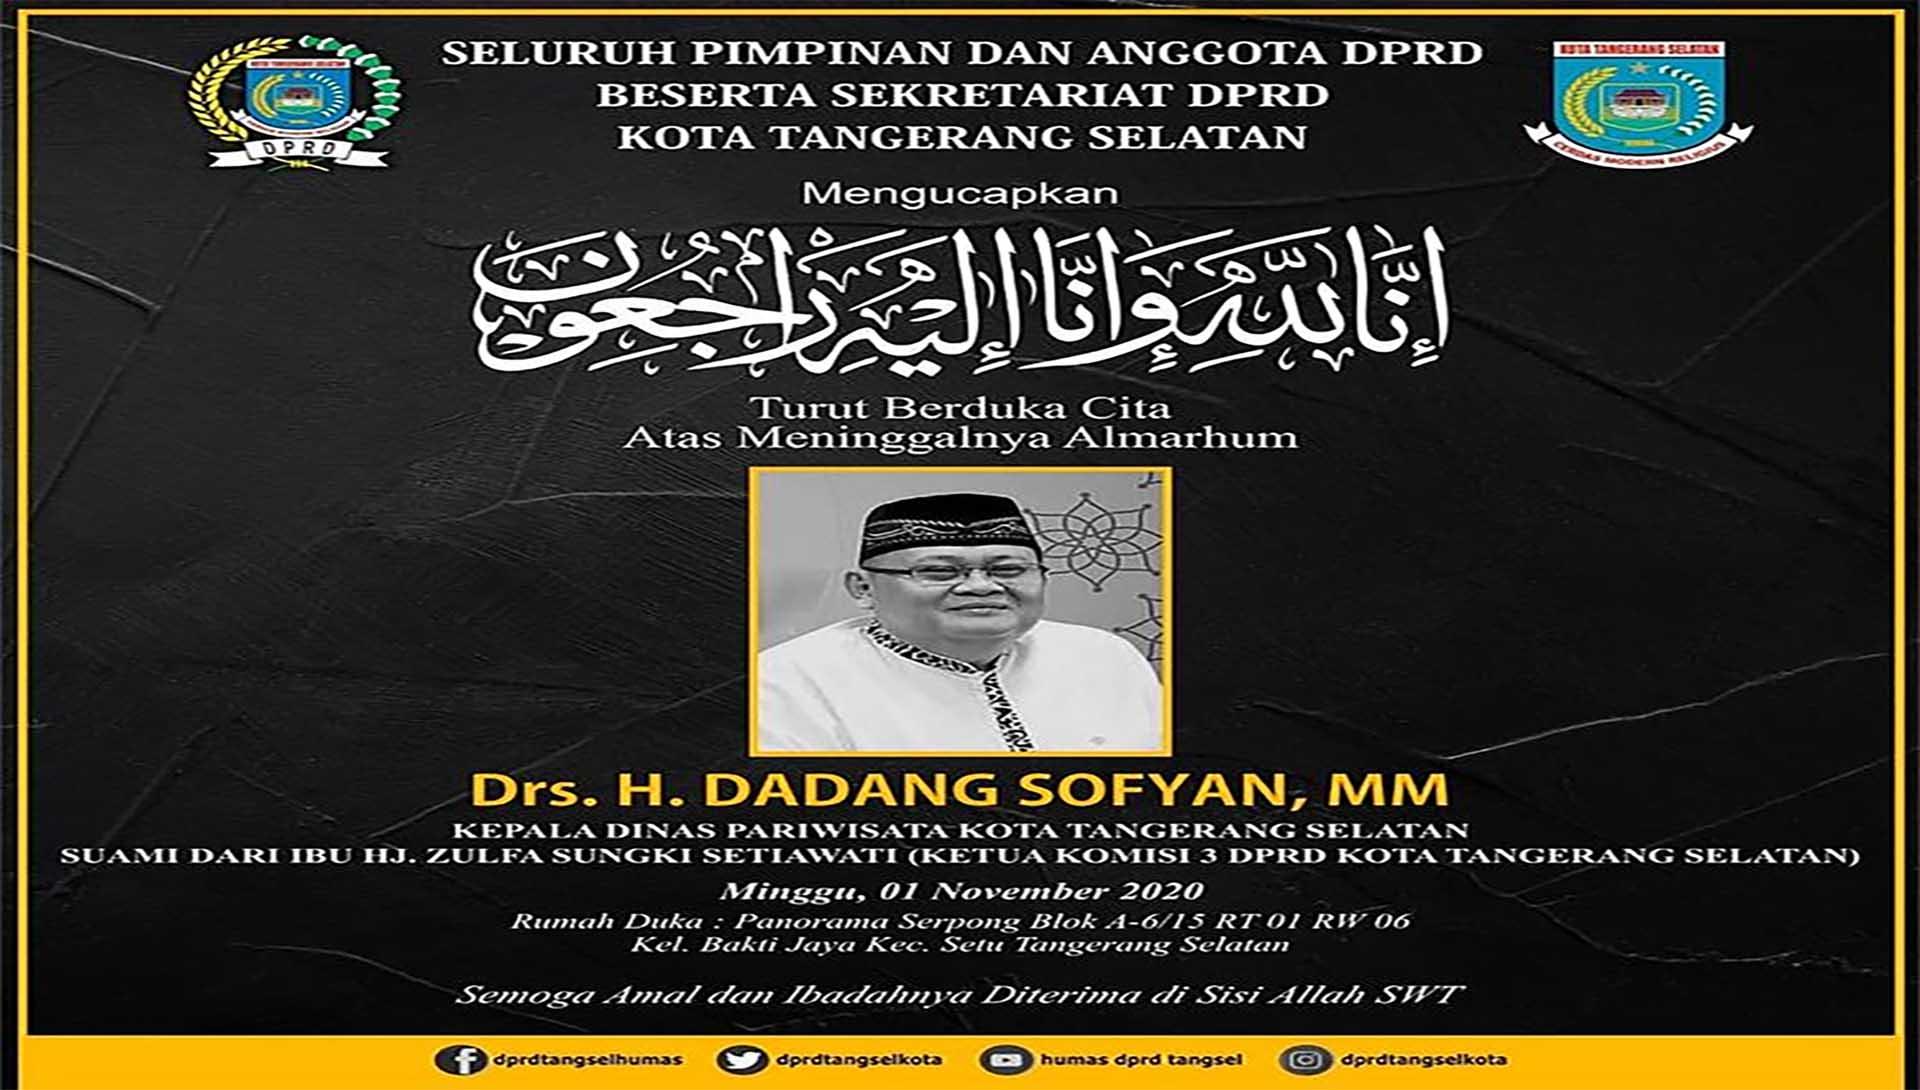 Turut Berduka Cita atas Wafatnya Drs. H. Dadang Sofyan, MM